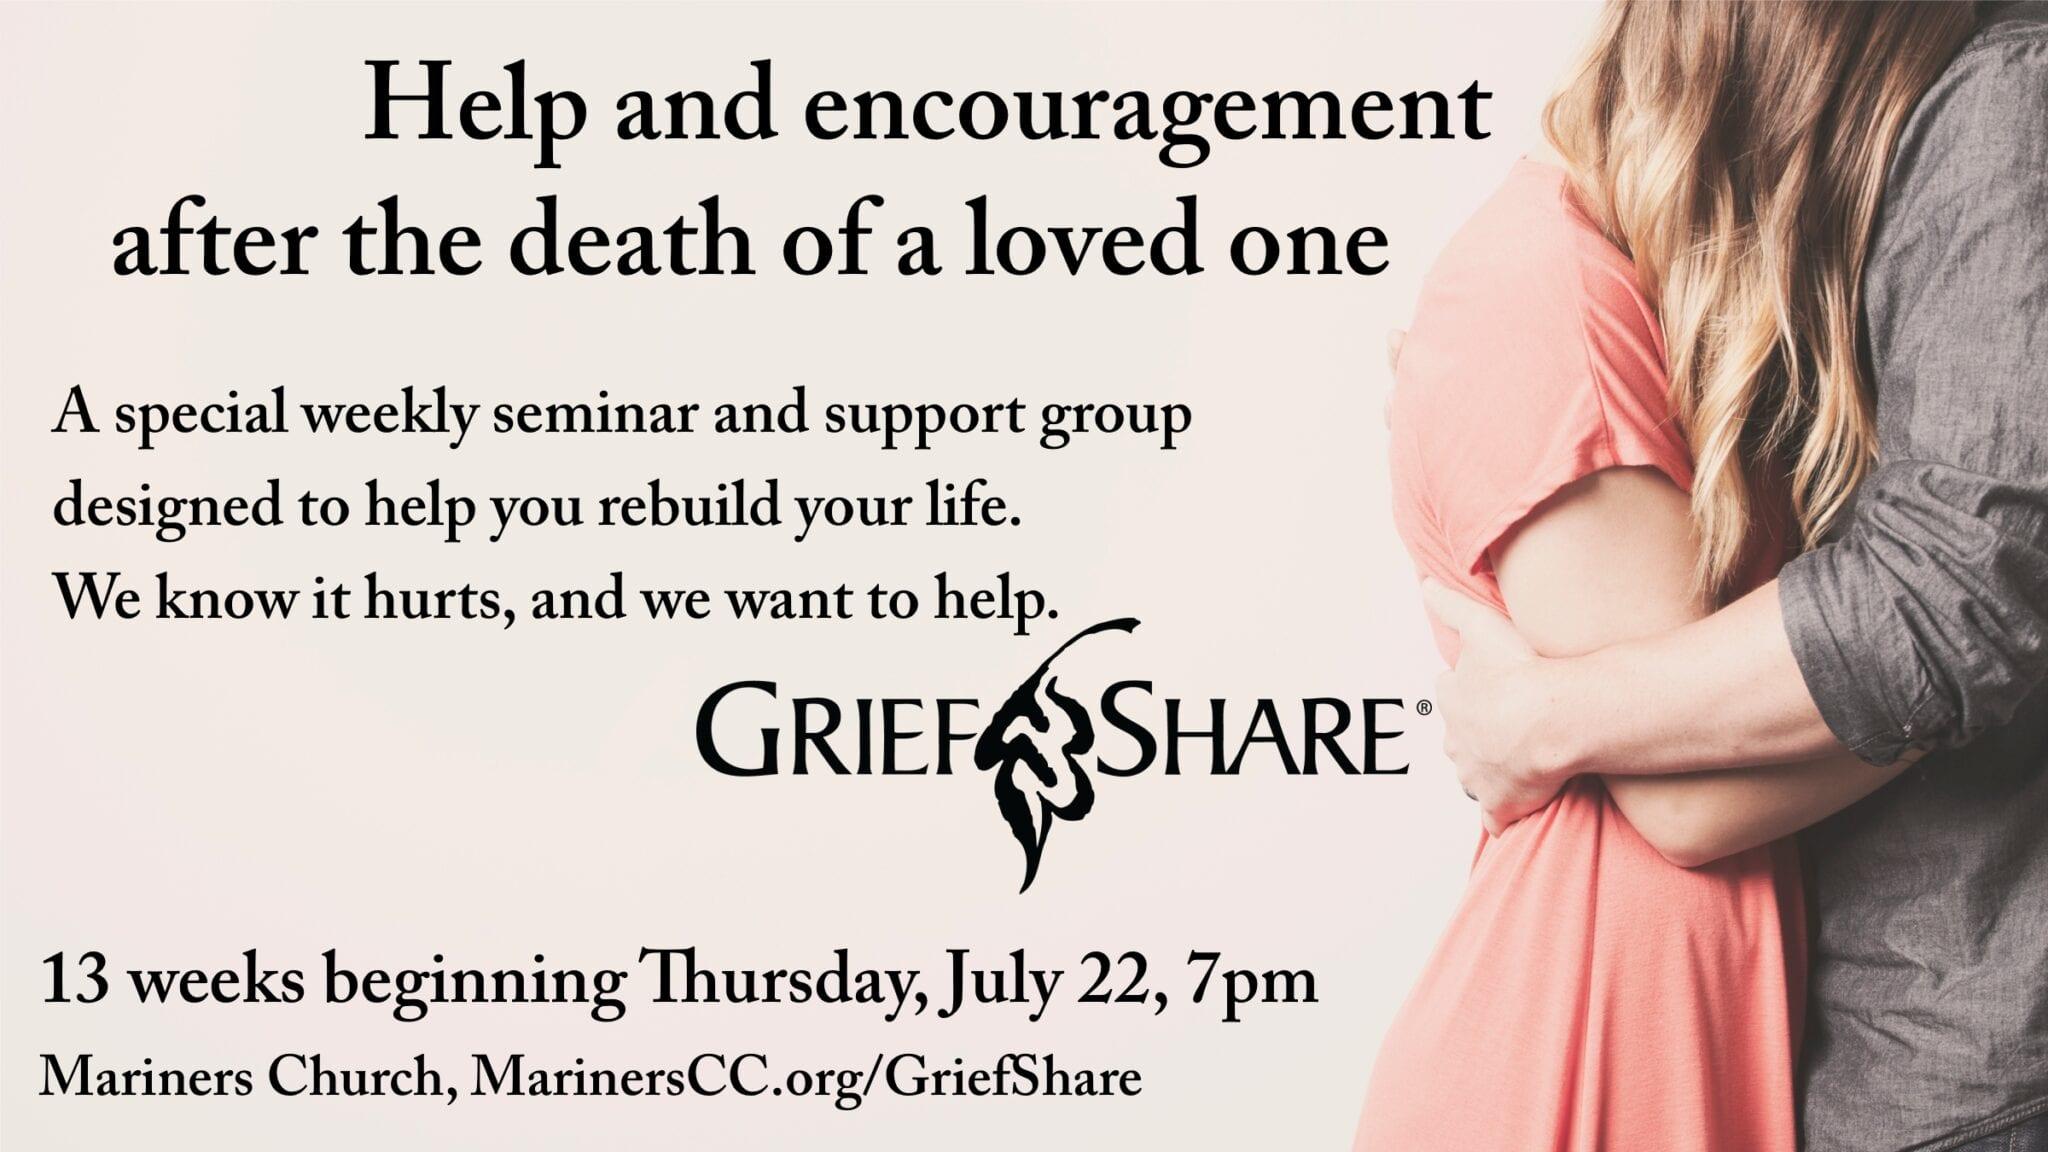 NEW GriefShare Group Beginning July 22!